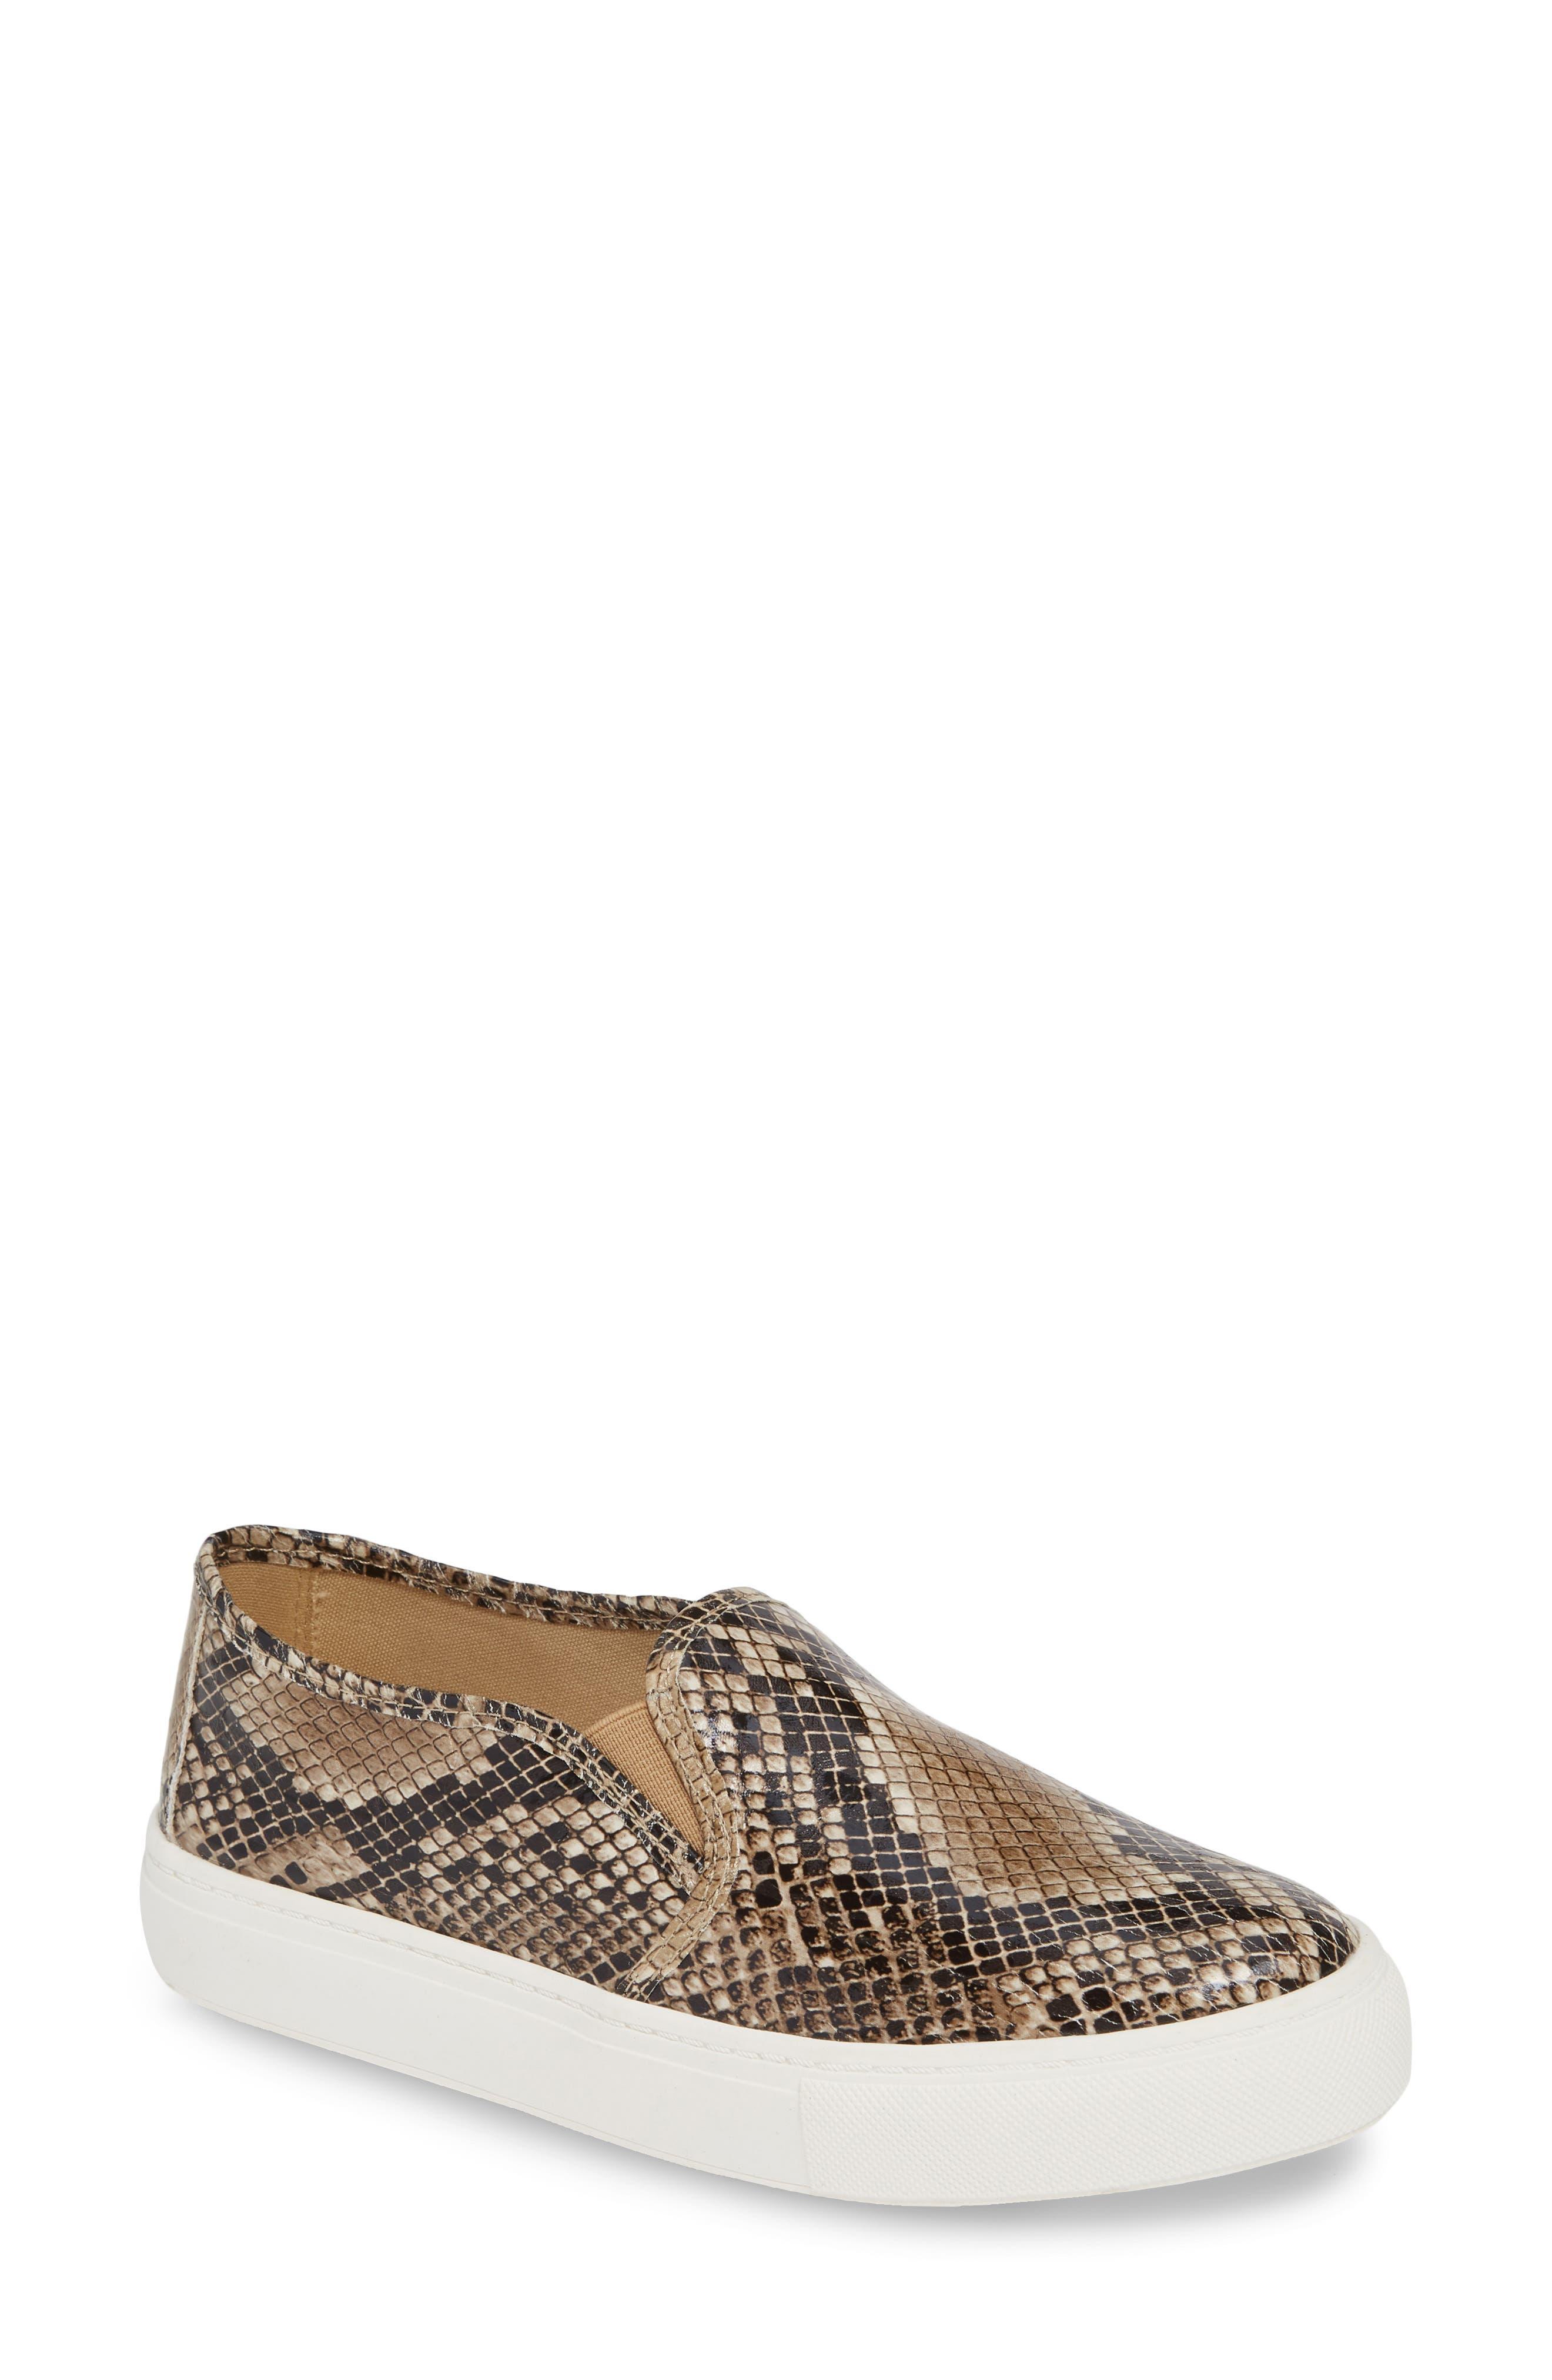 Mia Beca Snake Print Slip-On Sneaker, Beige